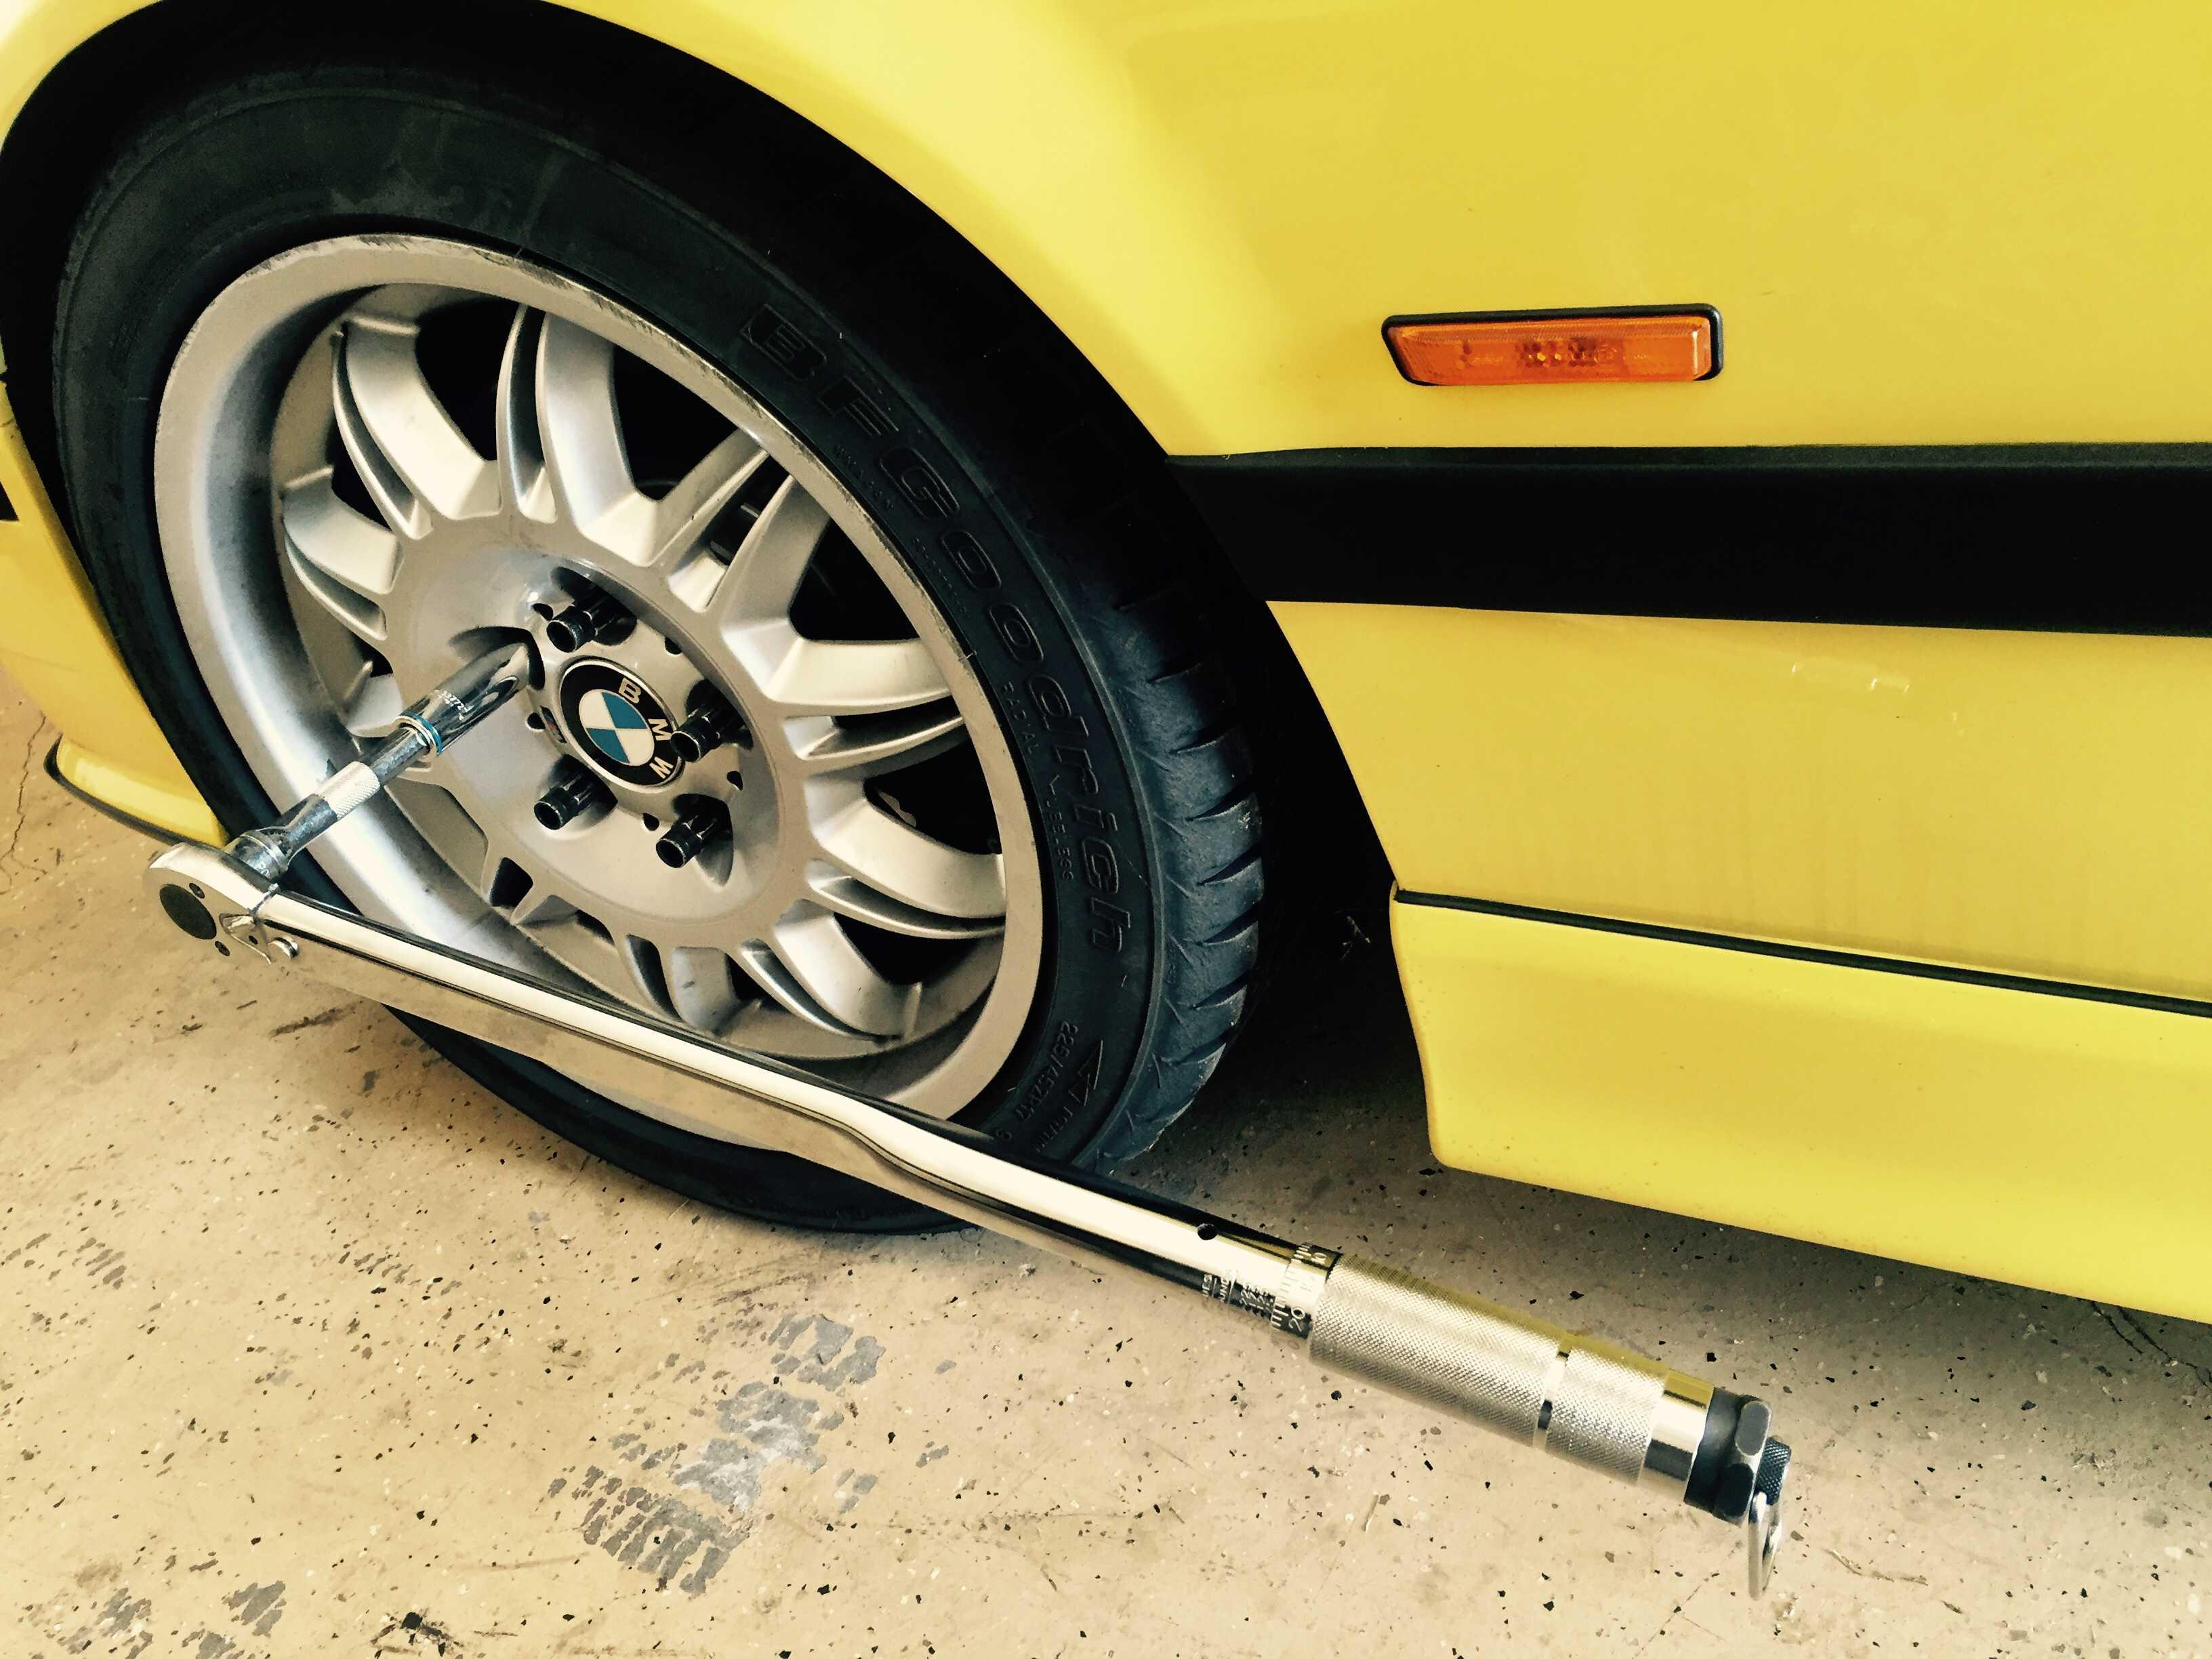 BMW wheel torque wrench